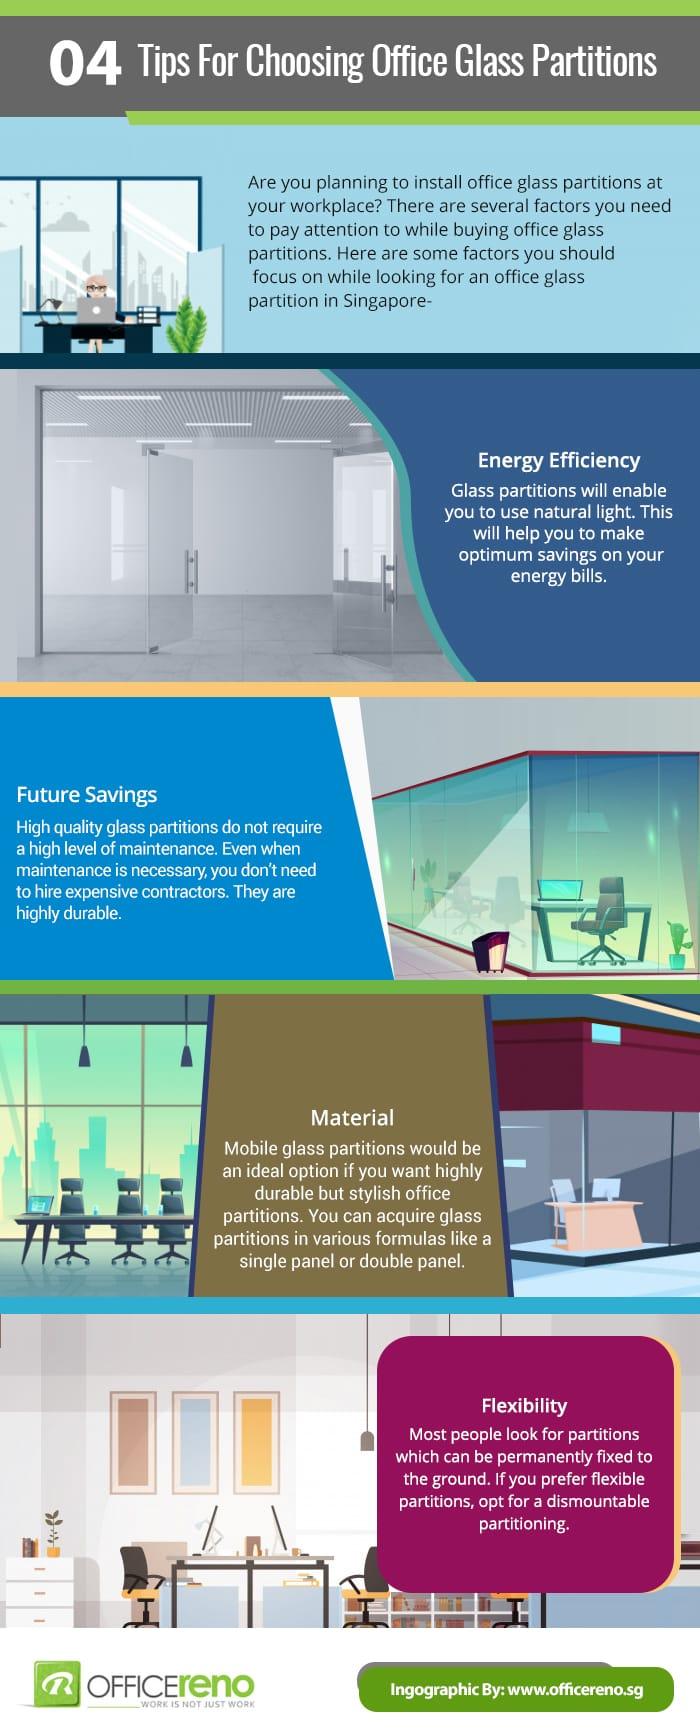 officereno-infographics